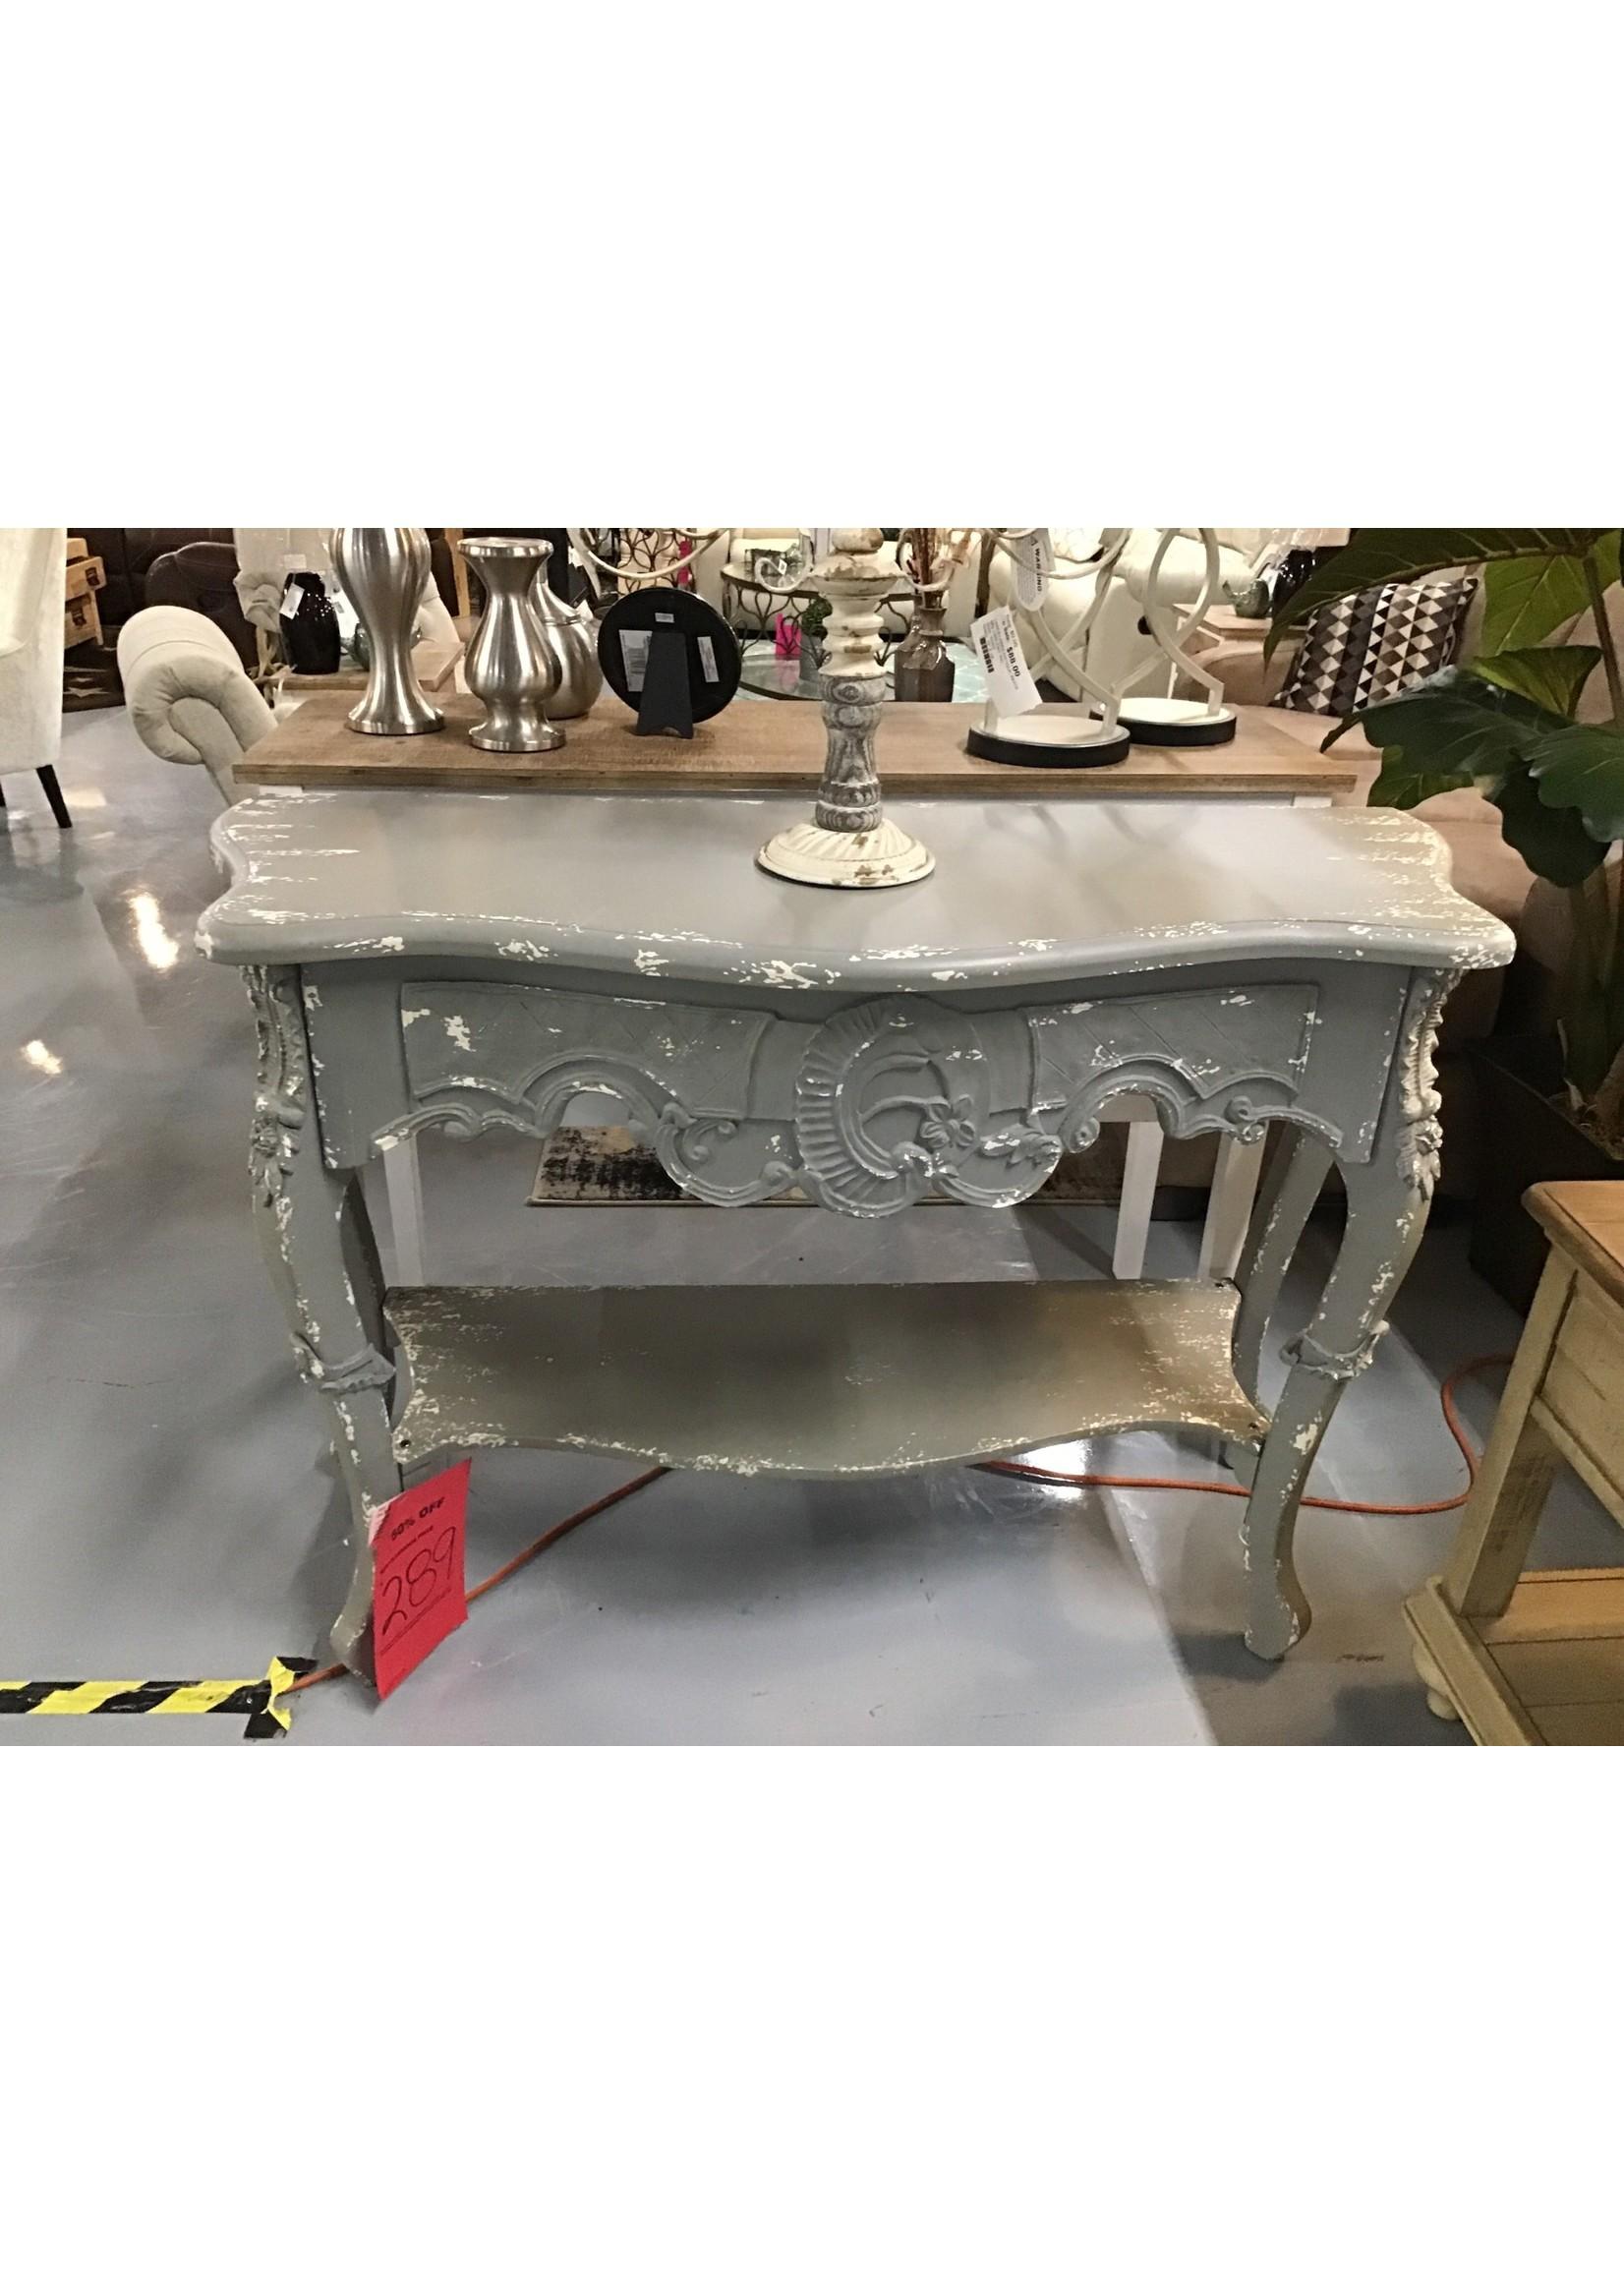 CREATIVE CO-OP DE5354 SOFA TABLE DISTRESSED GRAY